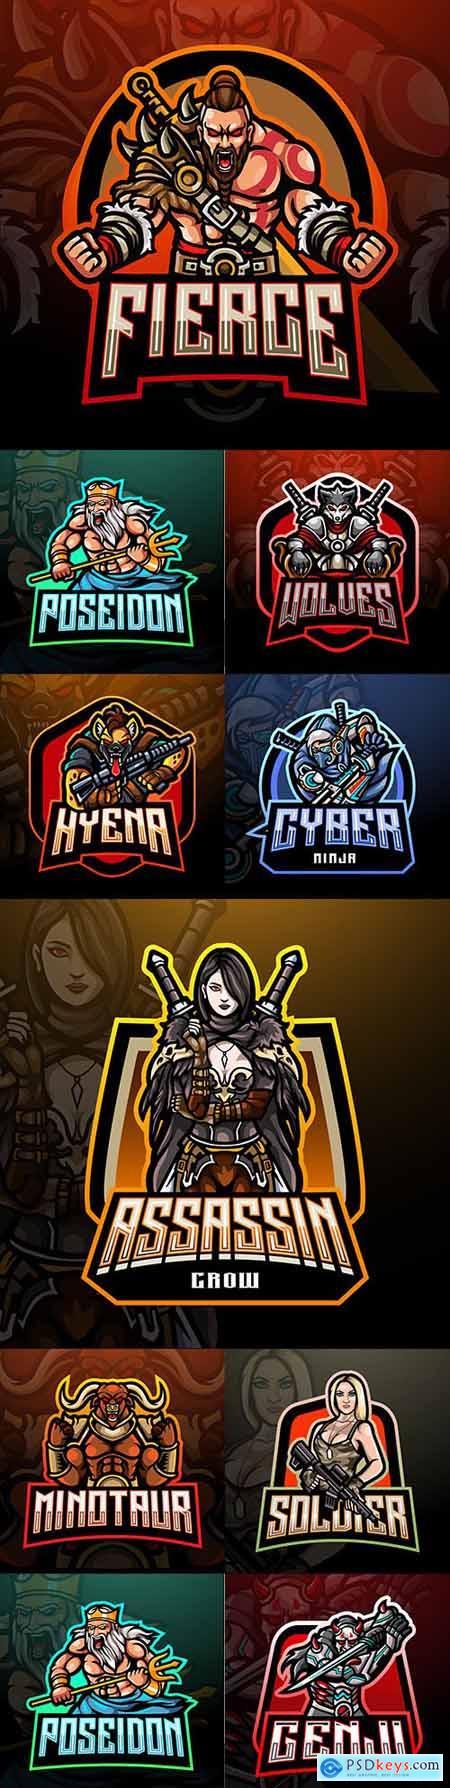 Emblem gaming mascot design cybersport illustration 22